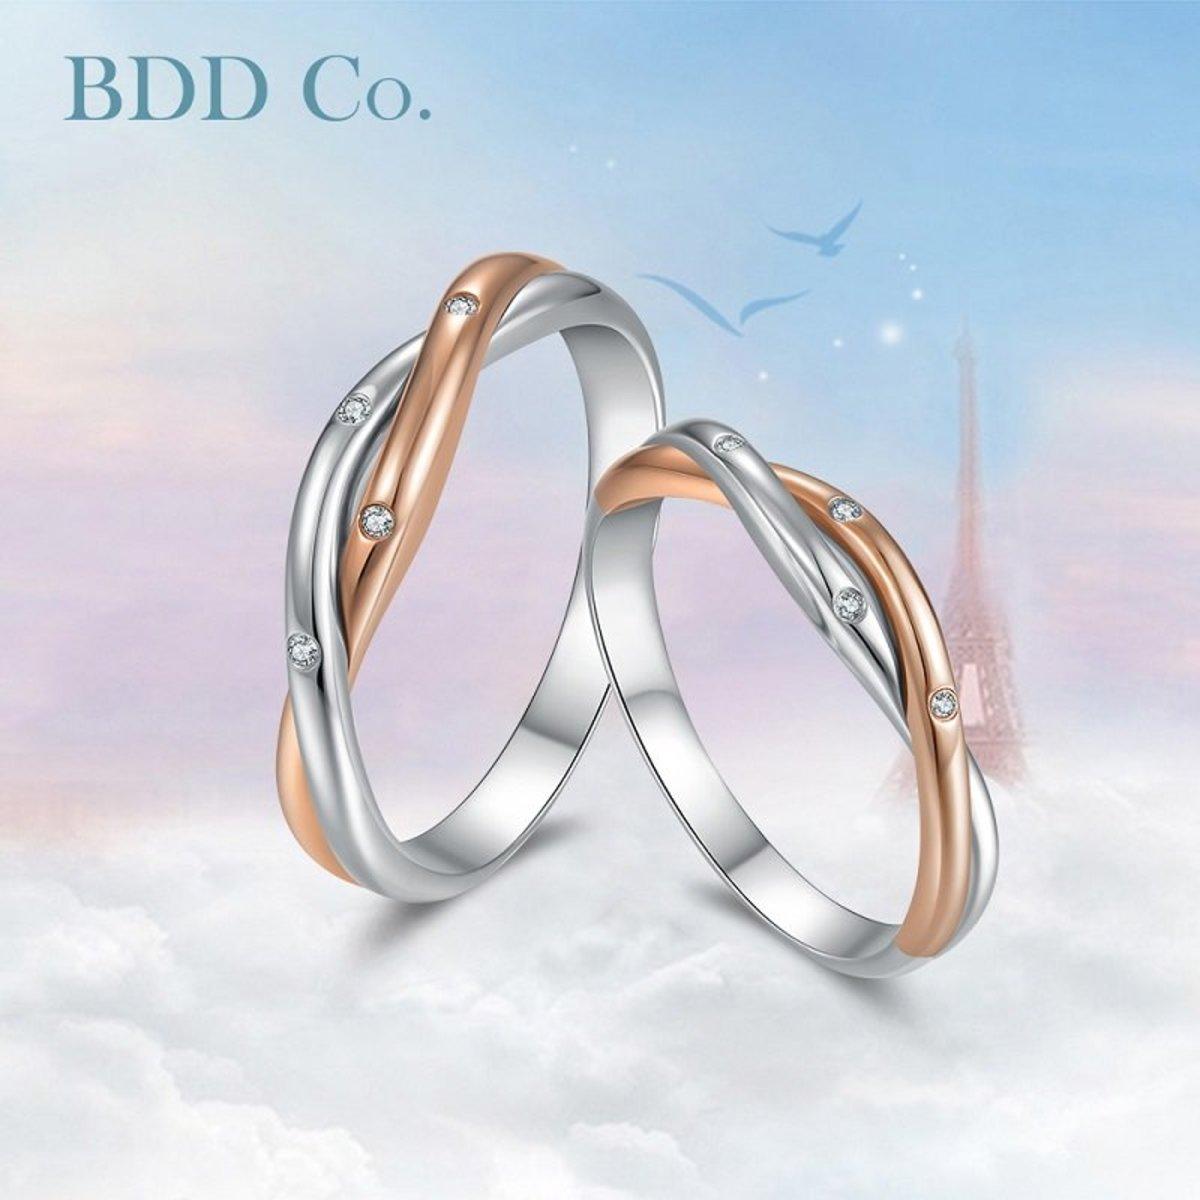 【BDD-Co.】18k鑽石情侶男戒 荊棘之愛